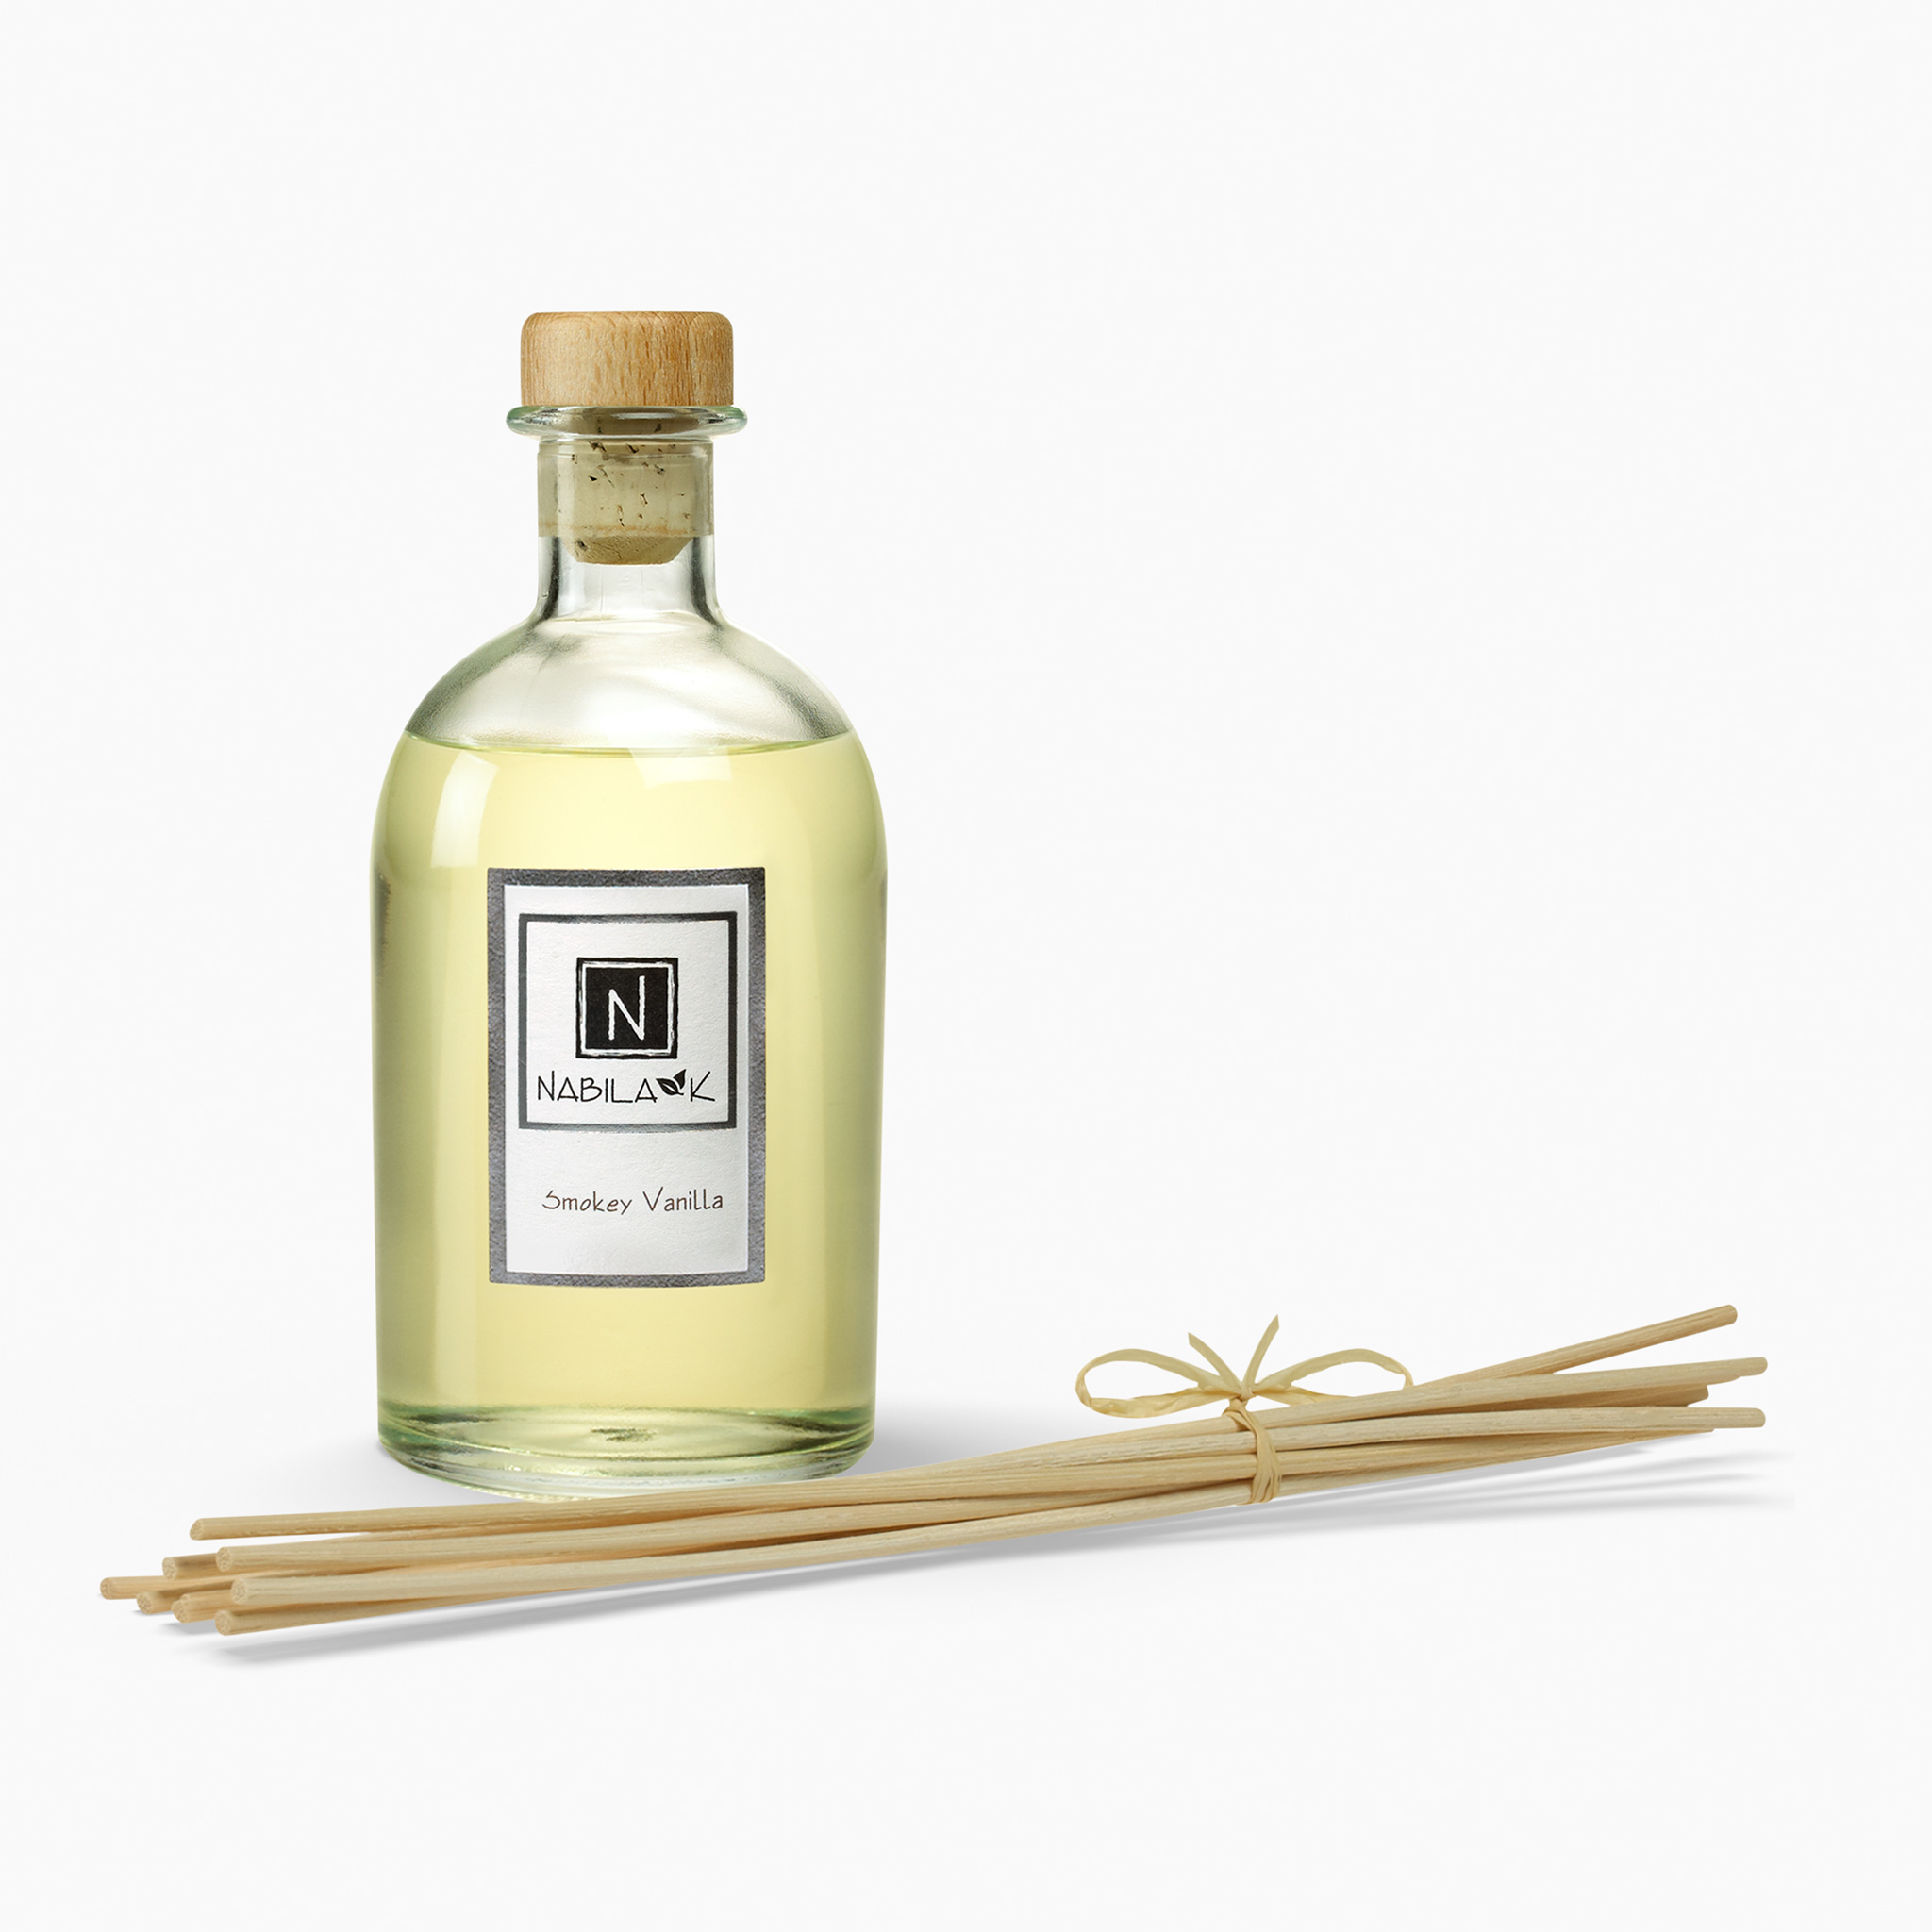 1 Bottle of Nabila K's Smokey Vanilla Diffuser with Reeds